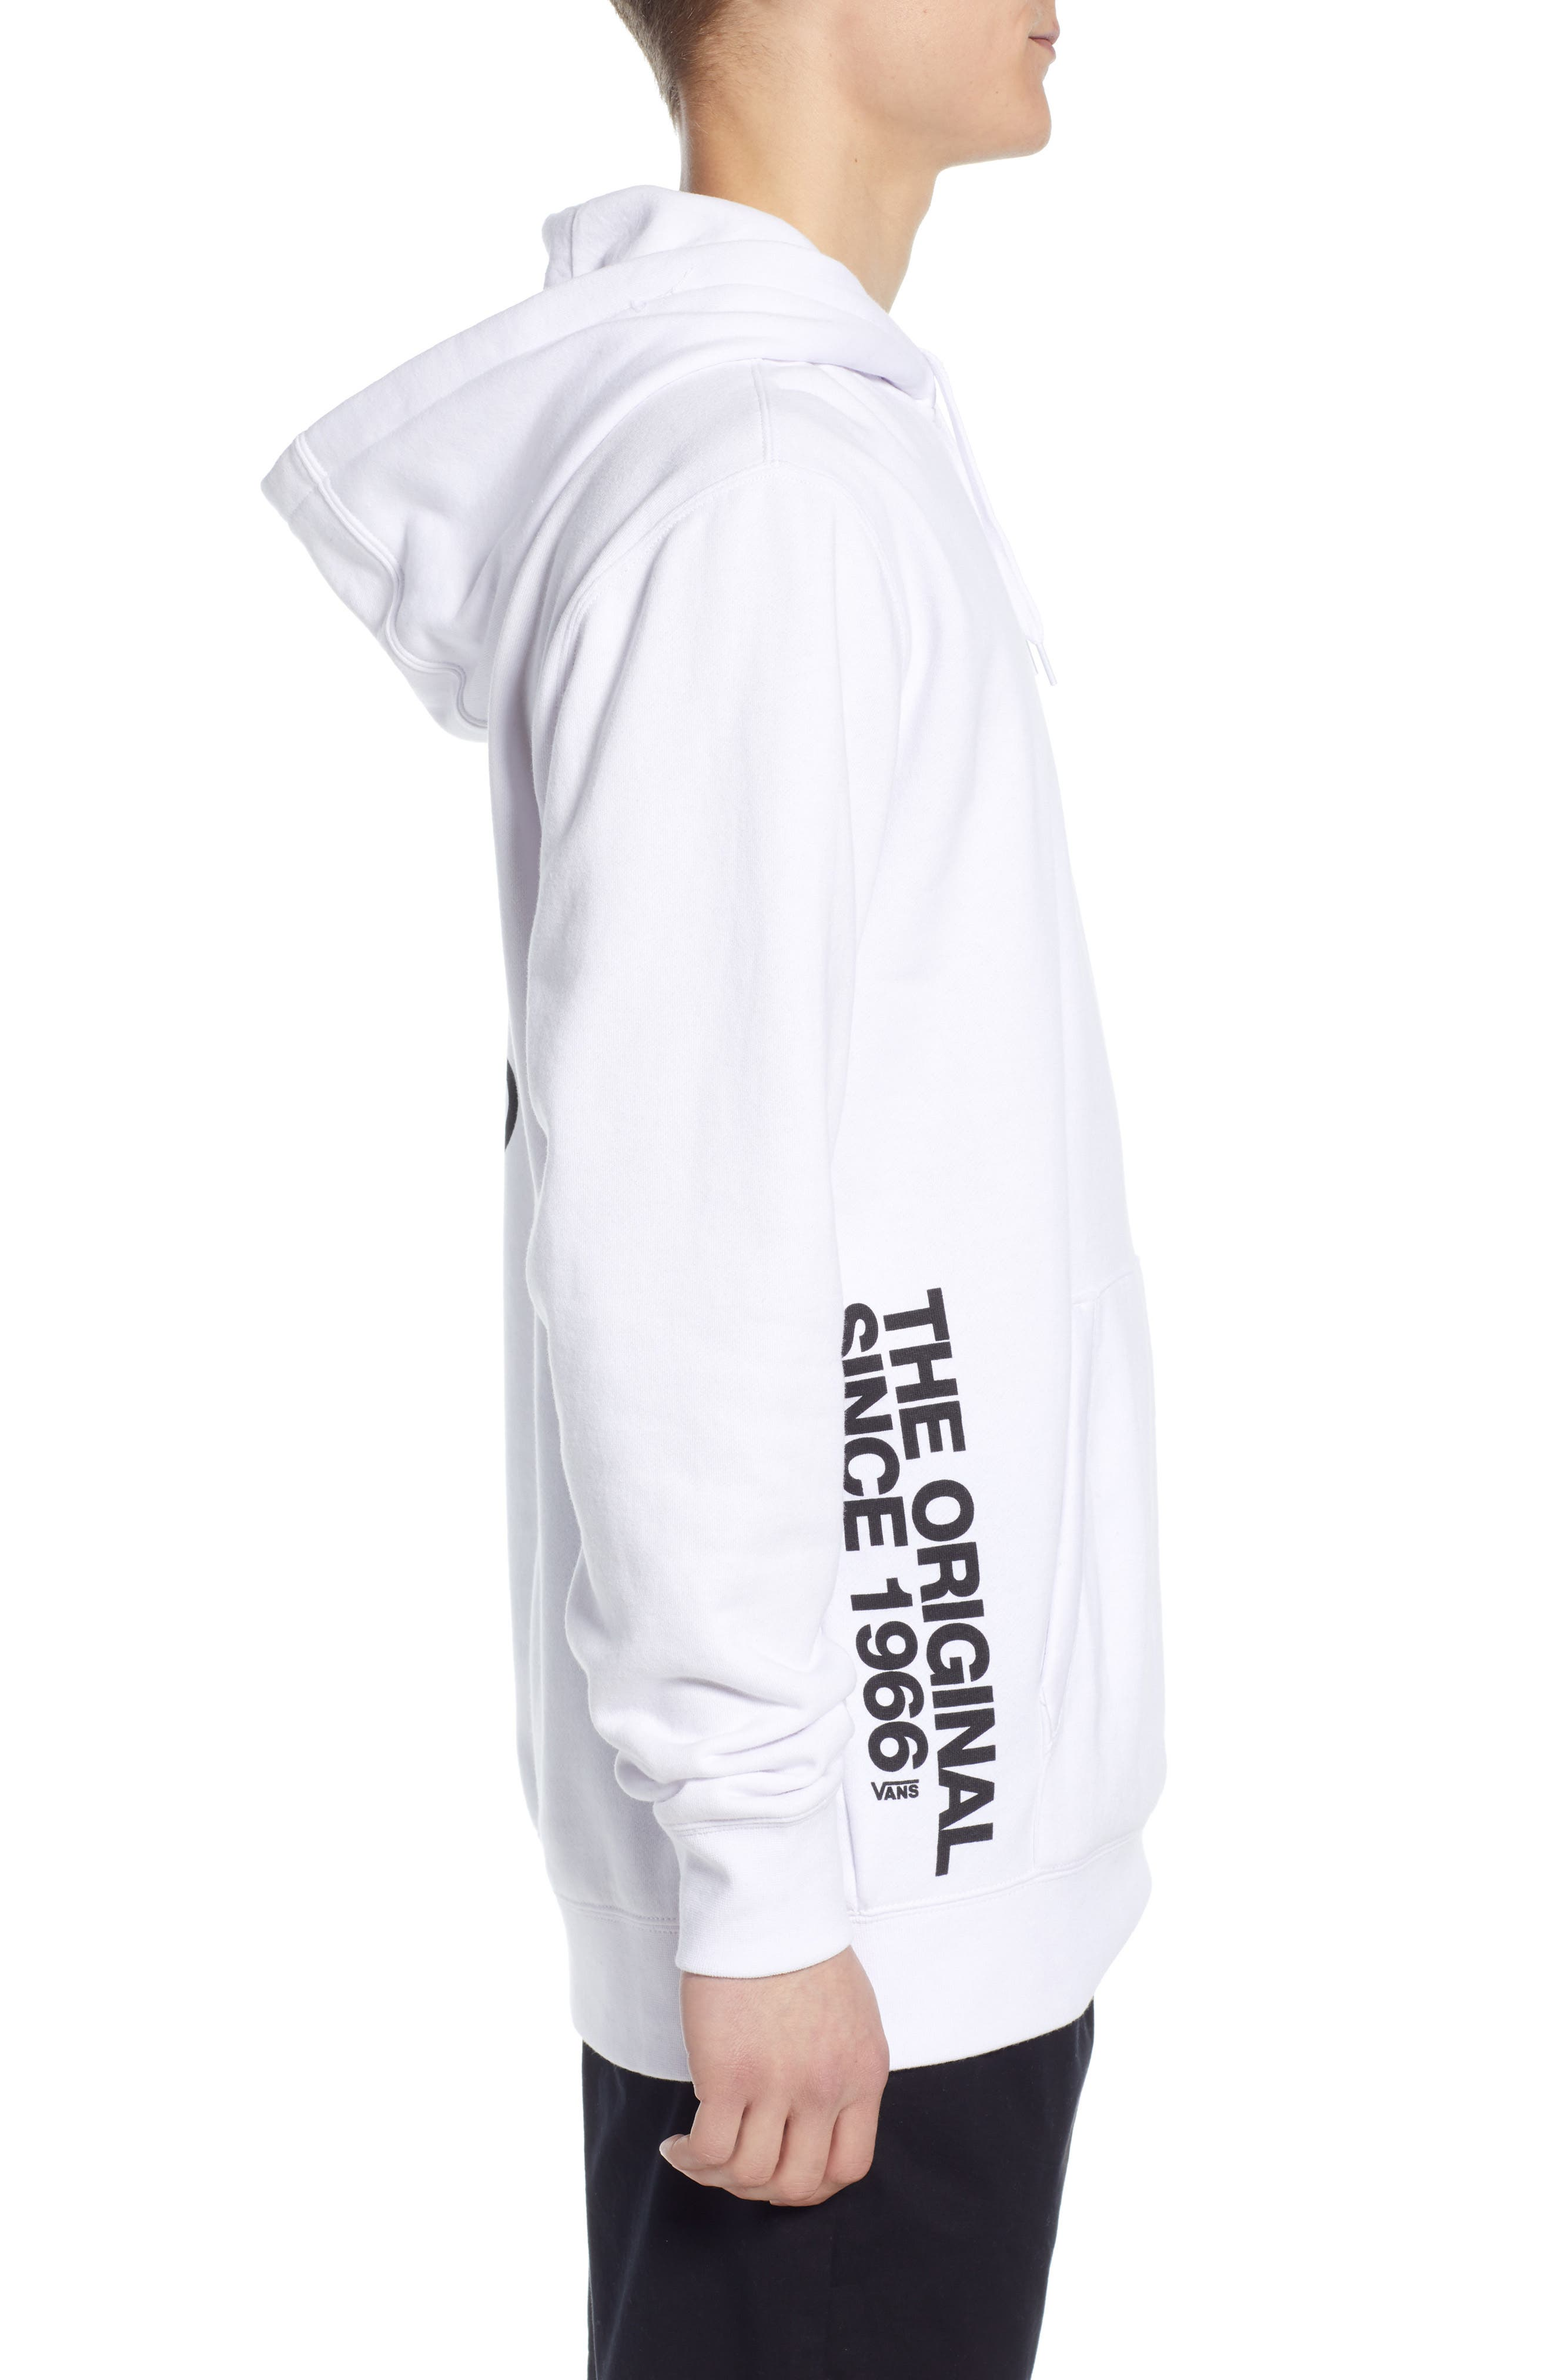 VANS, Off the Wall Distort Hooded Sweatshirt, Alternate thumbnail 3, color, WHITE